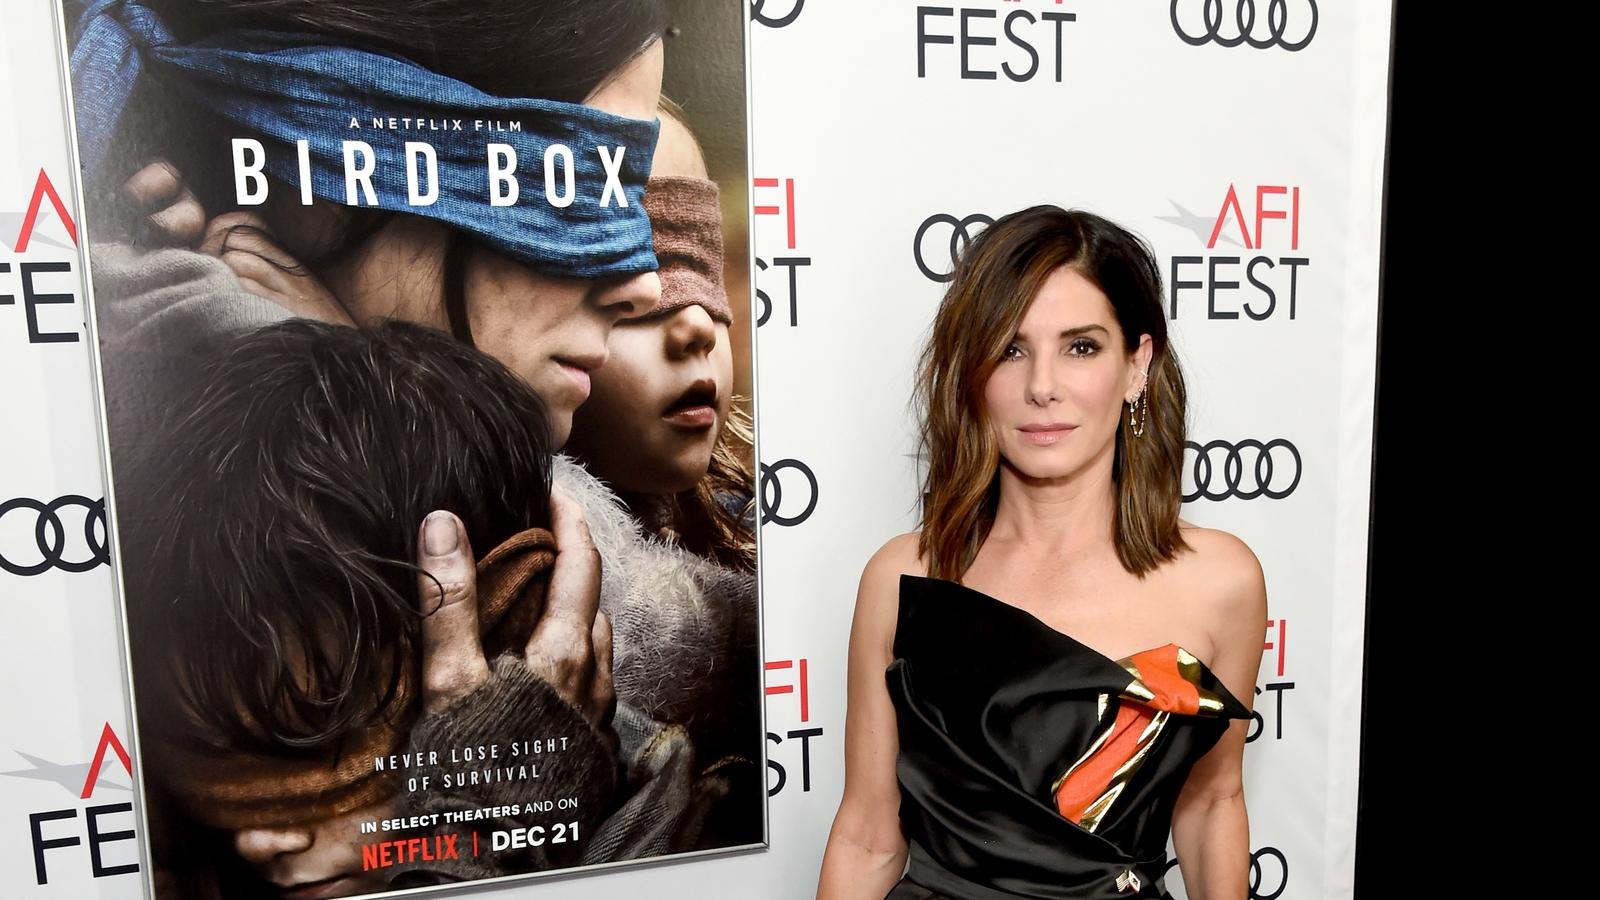 Netflix Warns Fans Over Bird Box Challenge